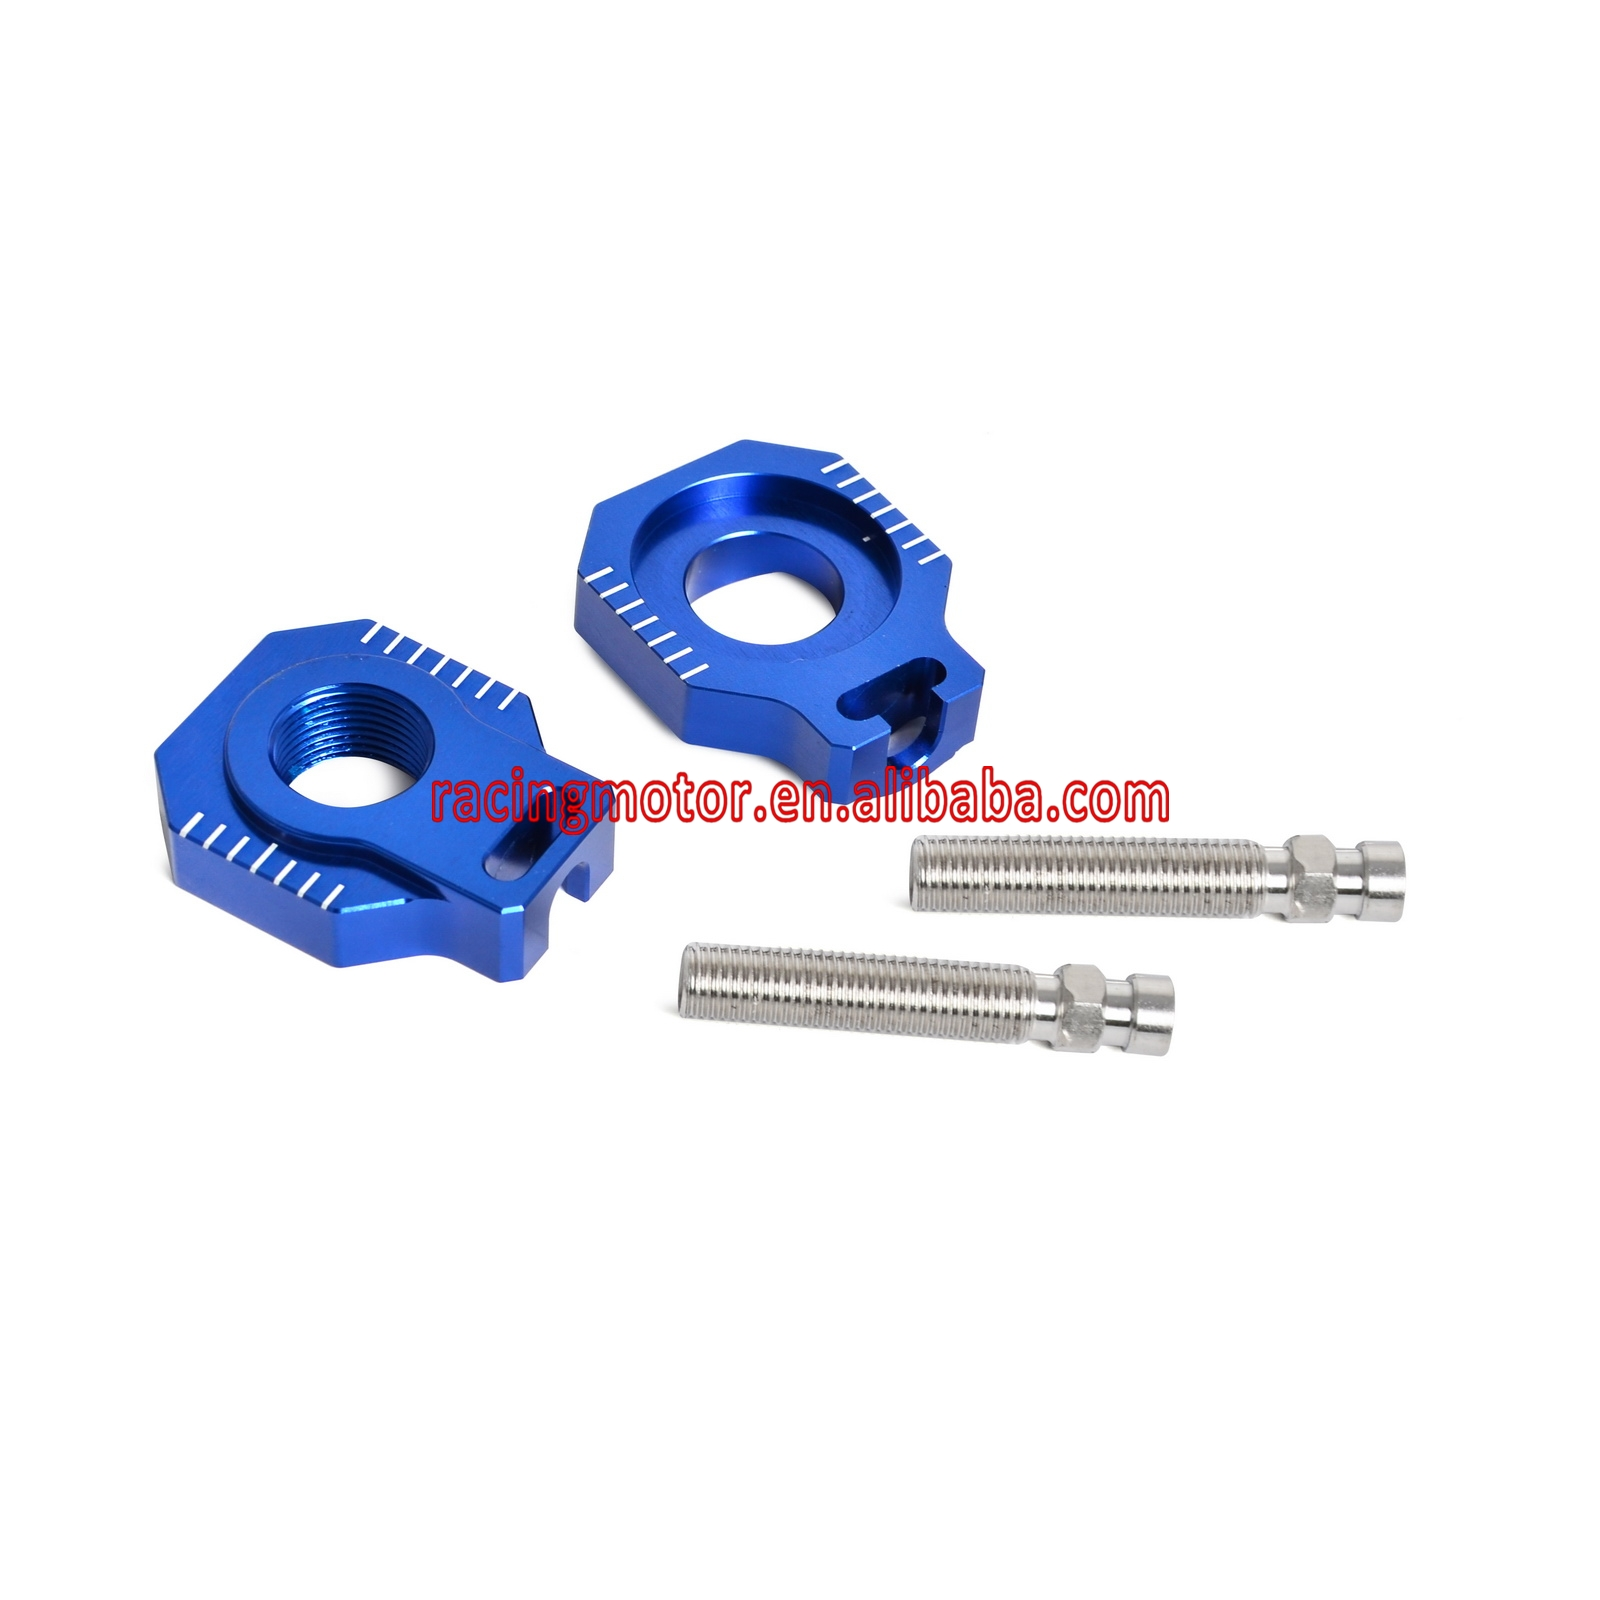 Rear Axle Blocks Chain Adjuster for Husqvarna TC TE 125 250 300 FC FE 250 350 450 501 Husaberg TE 250-300 FE 250-570